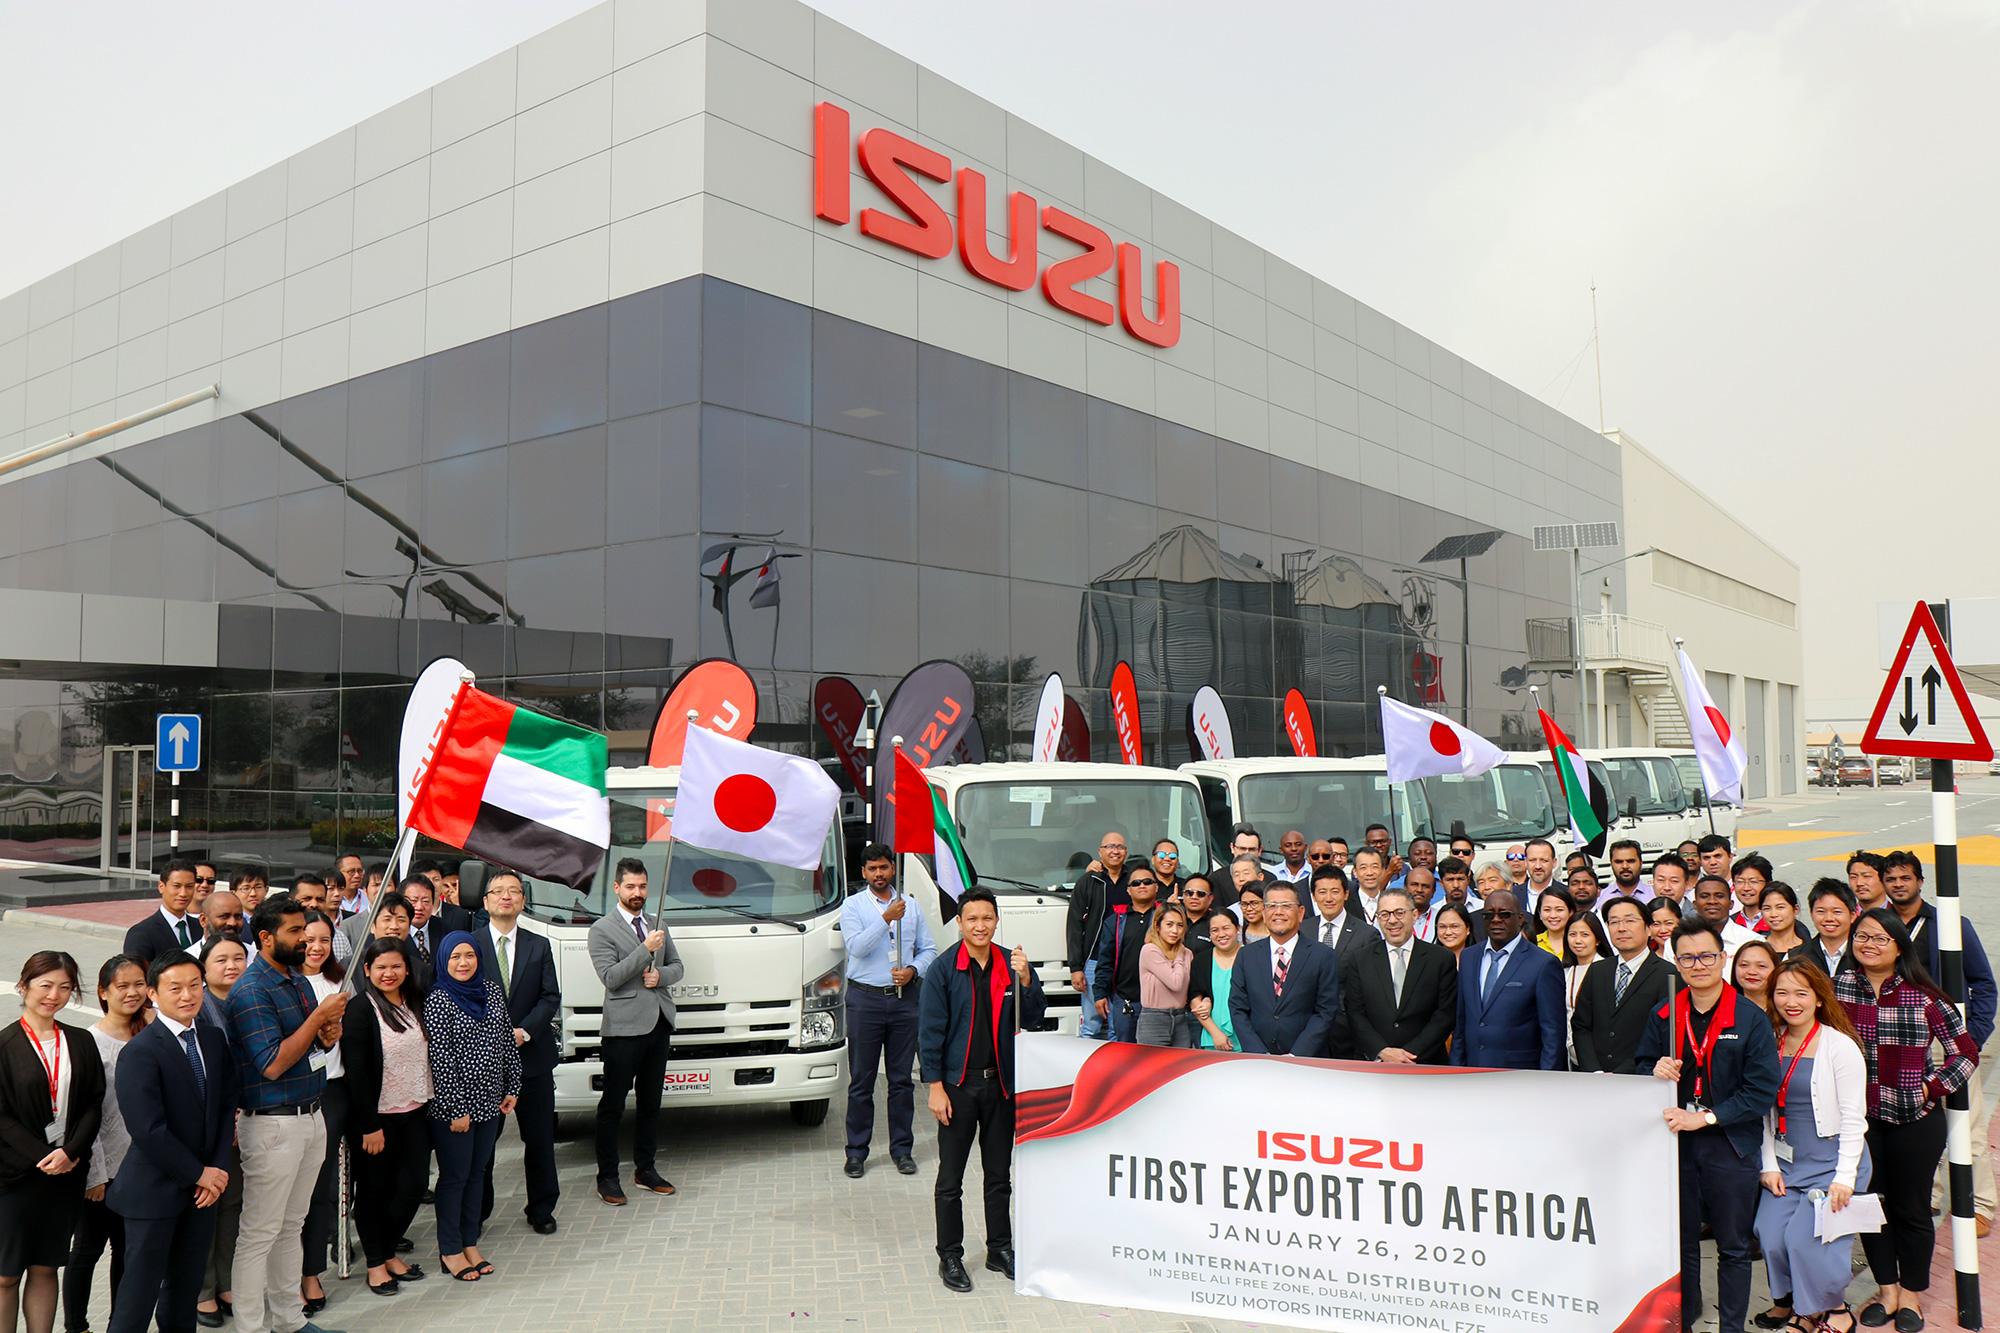 Isuzu First Export to Africa Group Photo